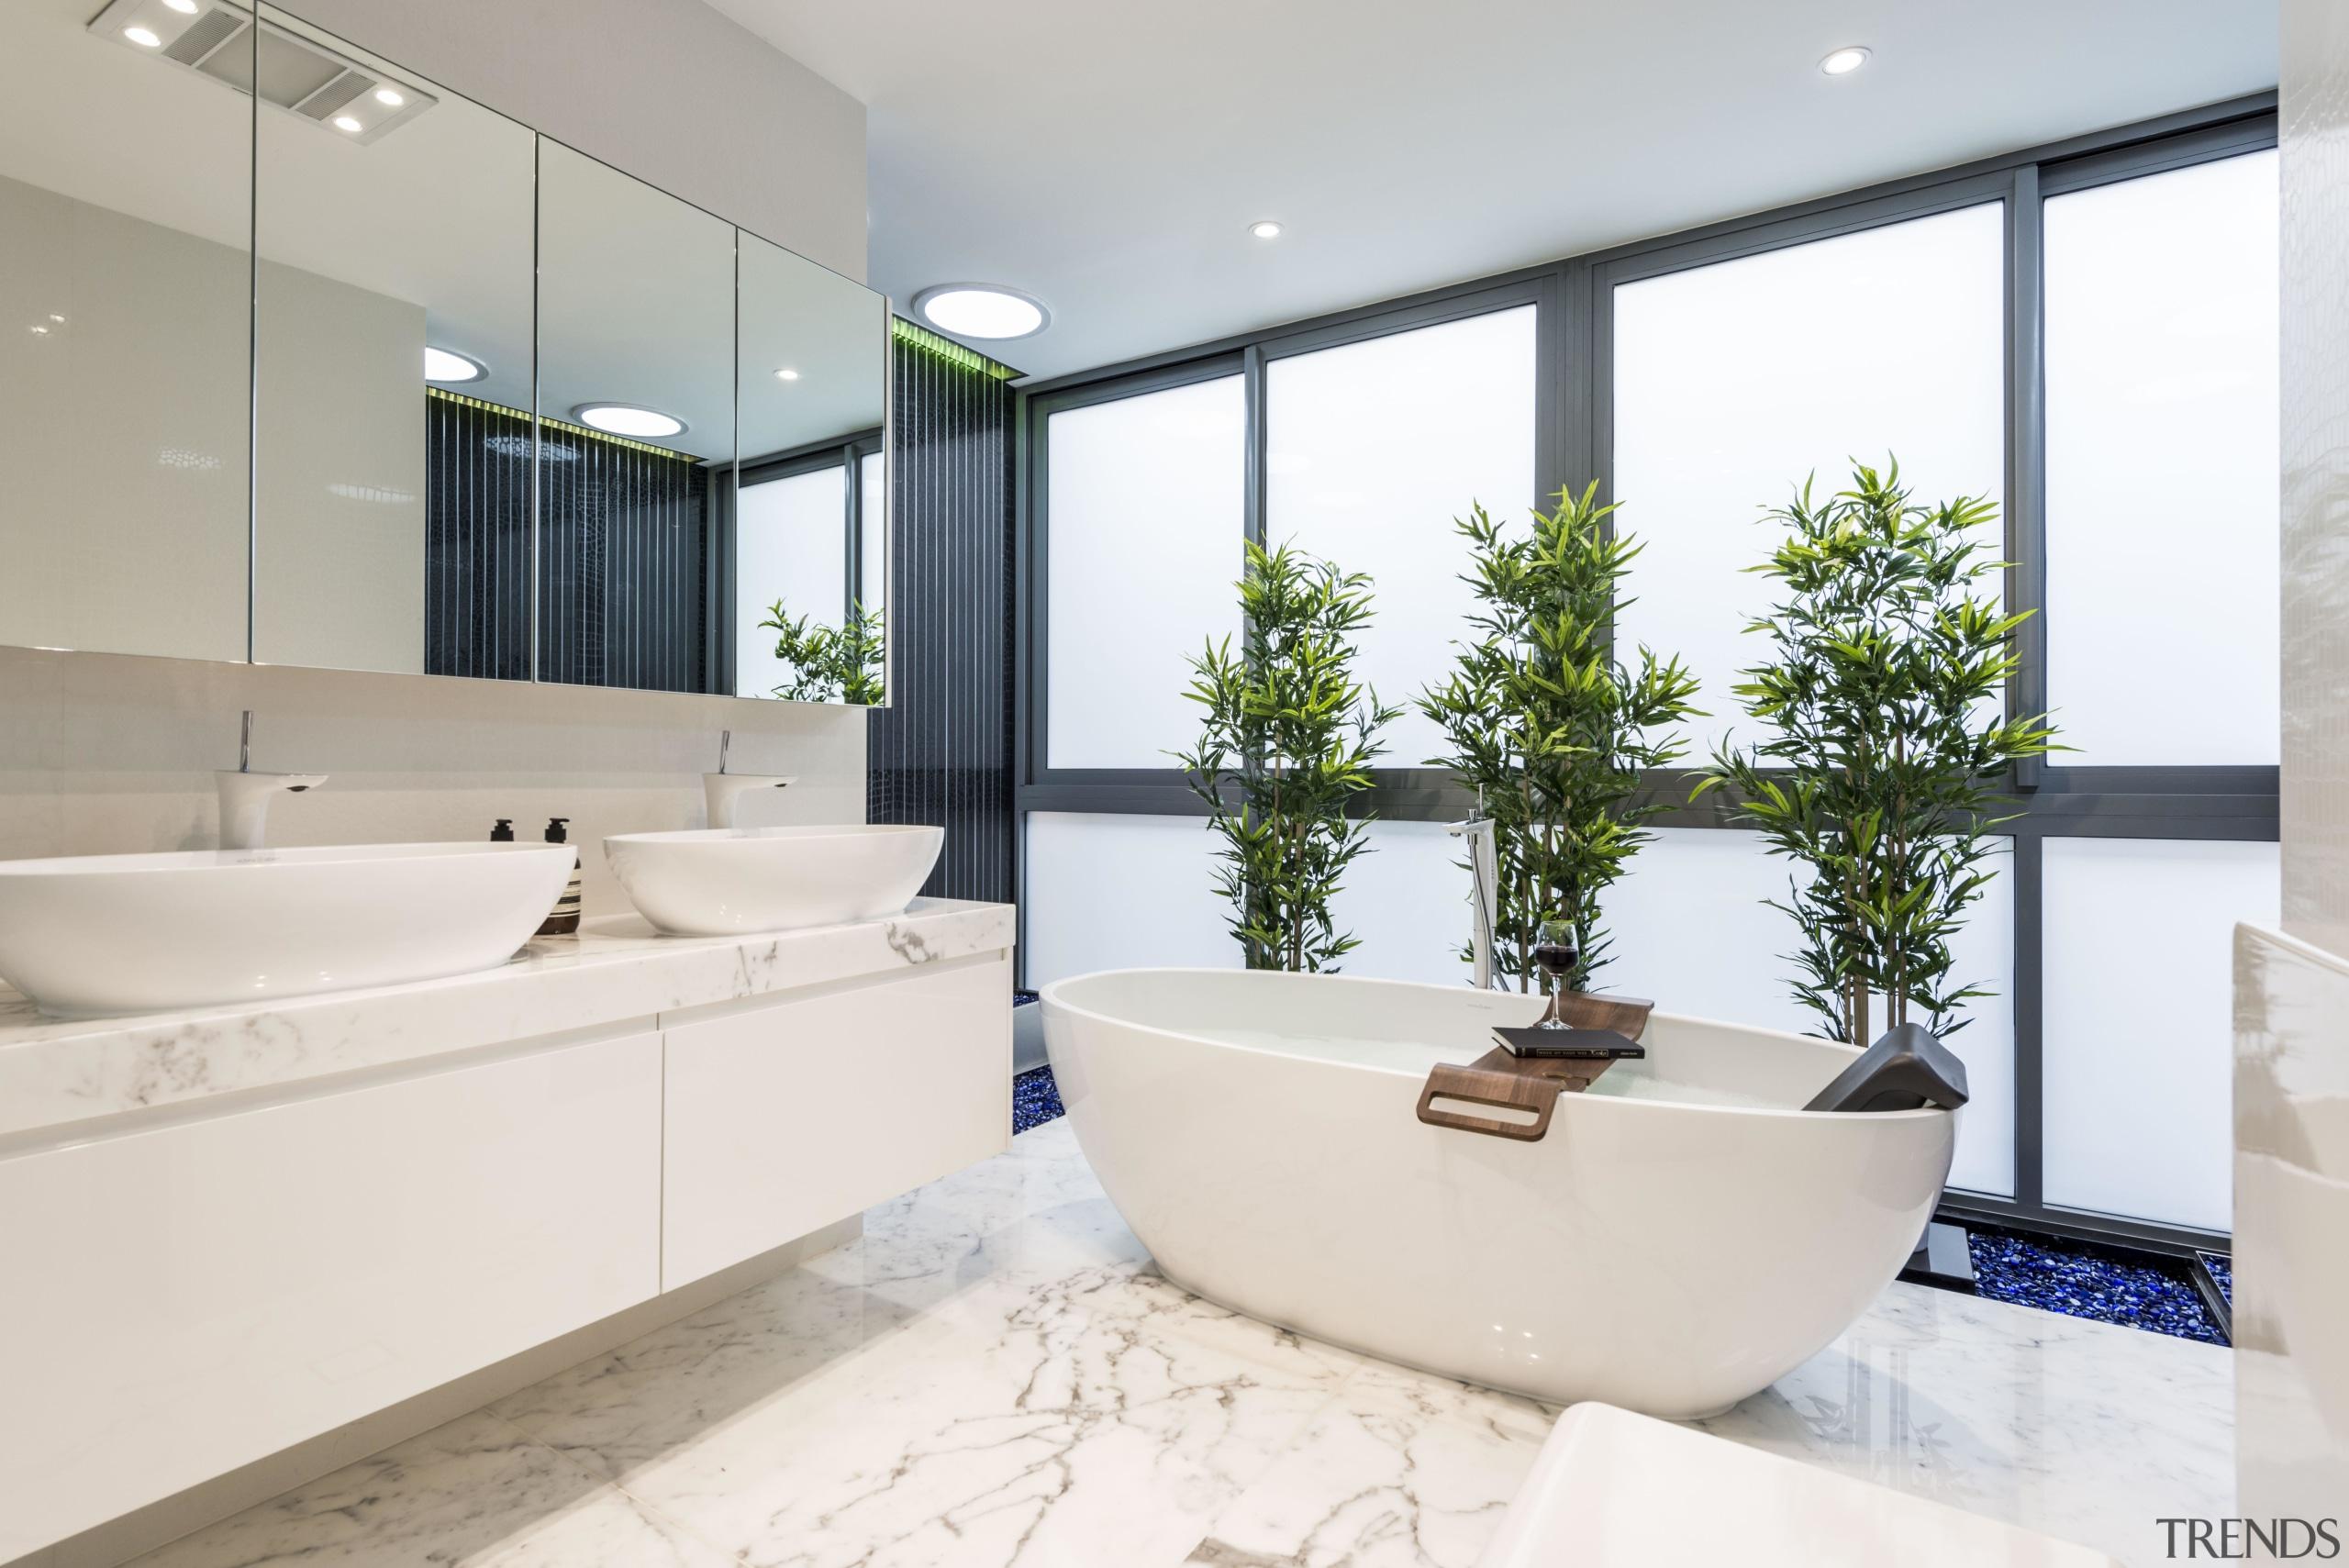 The black Caesarstone in a crocodile pattern that bathroom, estate, home, interior design, property, real estate, room, white